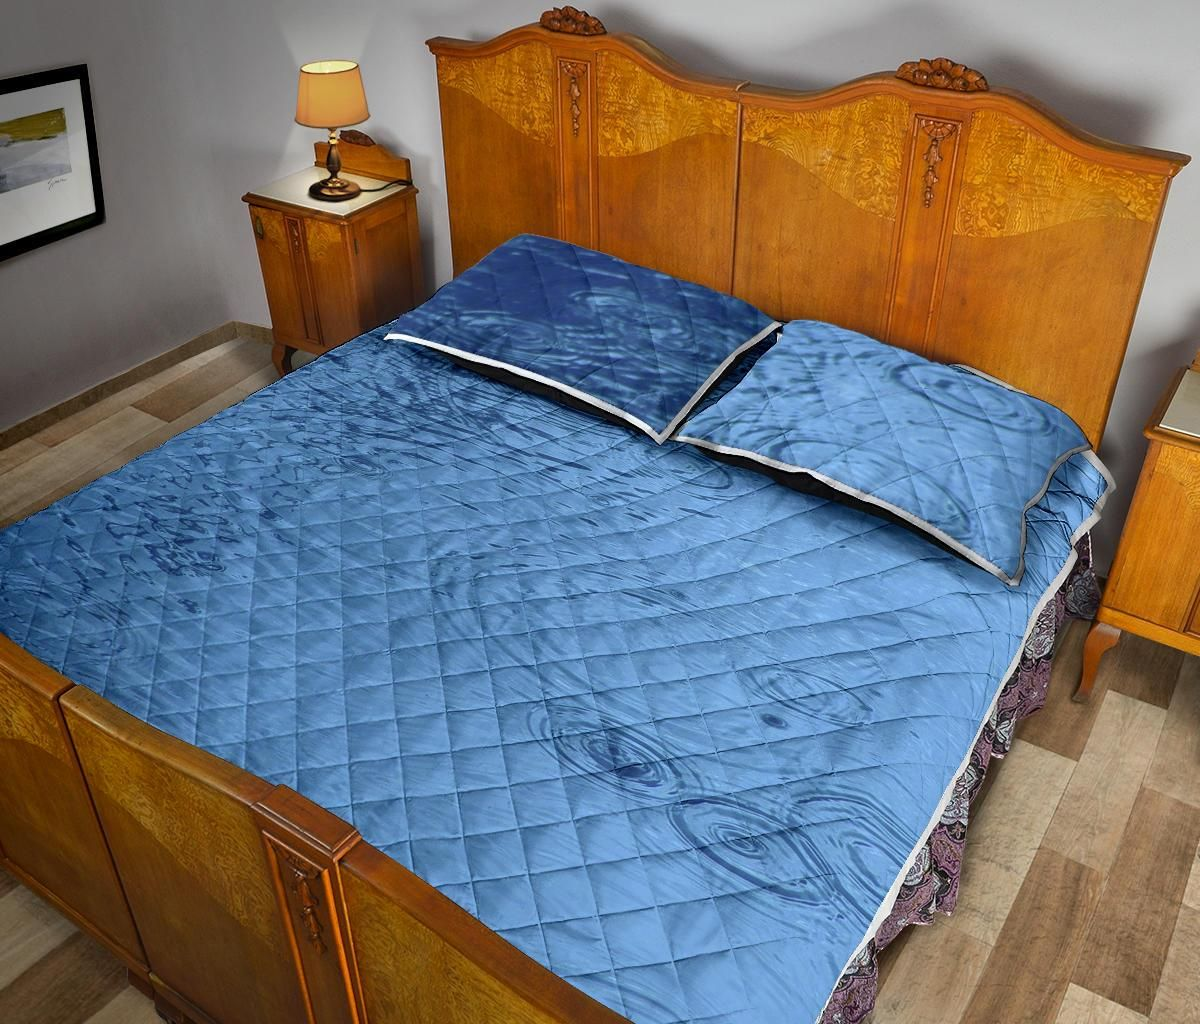 Comfort Quilt Bed Set Collection Nature 08 - Quilt Bed Set - Comfort Quilt Bed Set Collection Nature 08 / Twin